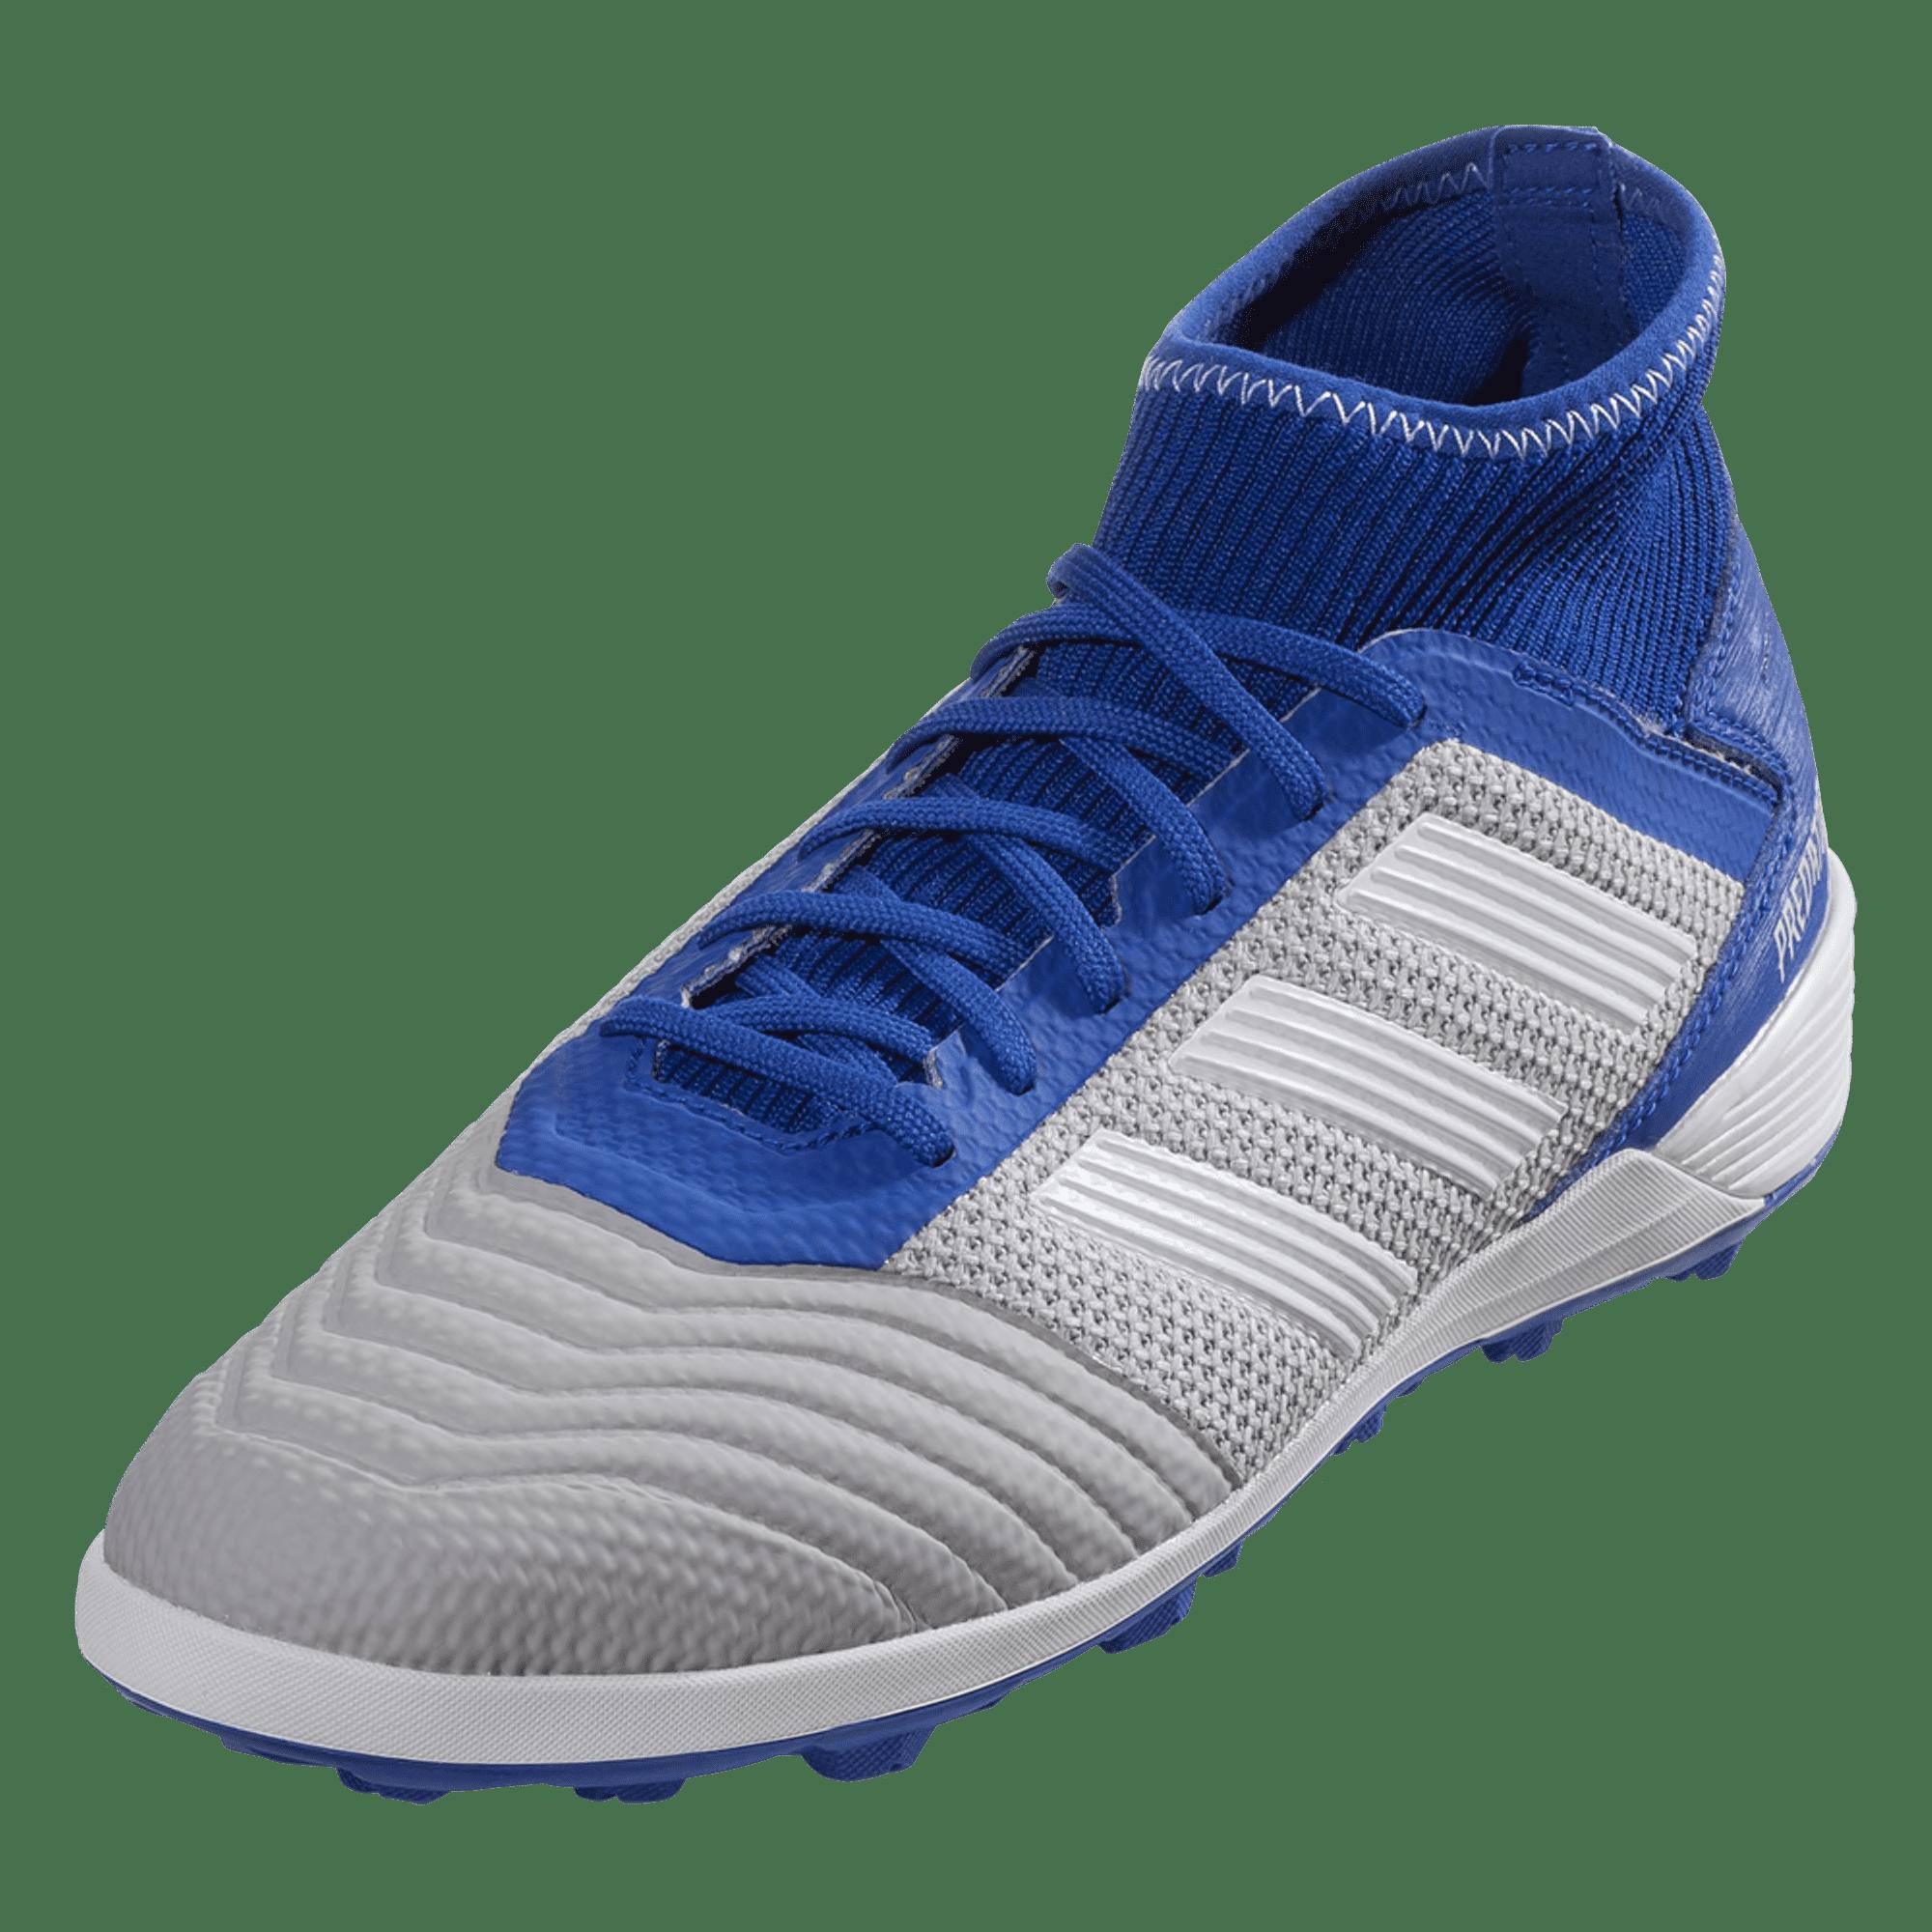 ca55896360 adidas Predator Tango 19.3 TF Artificial Turf Soccer Shoe – Grey ...